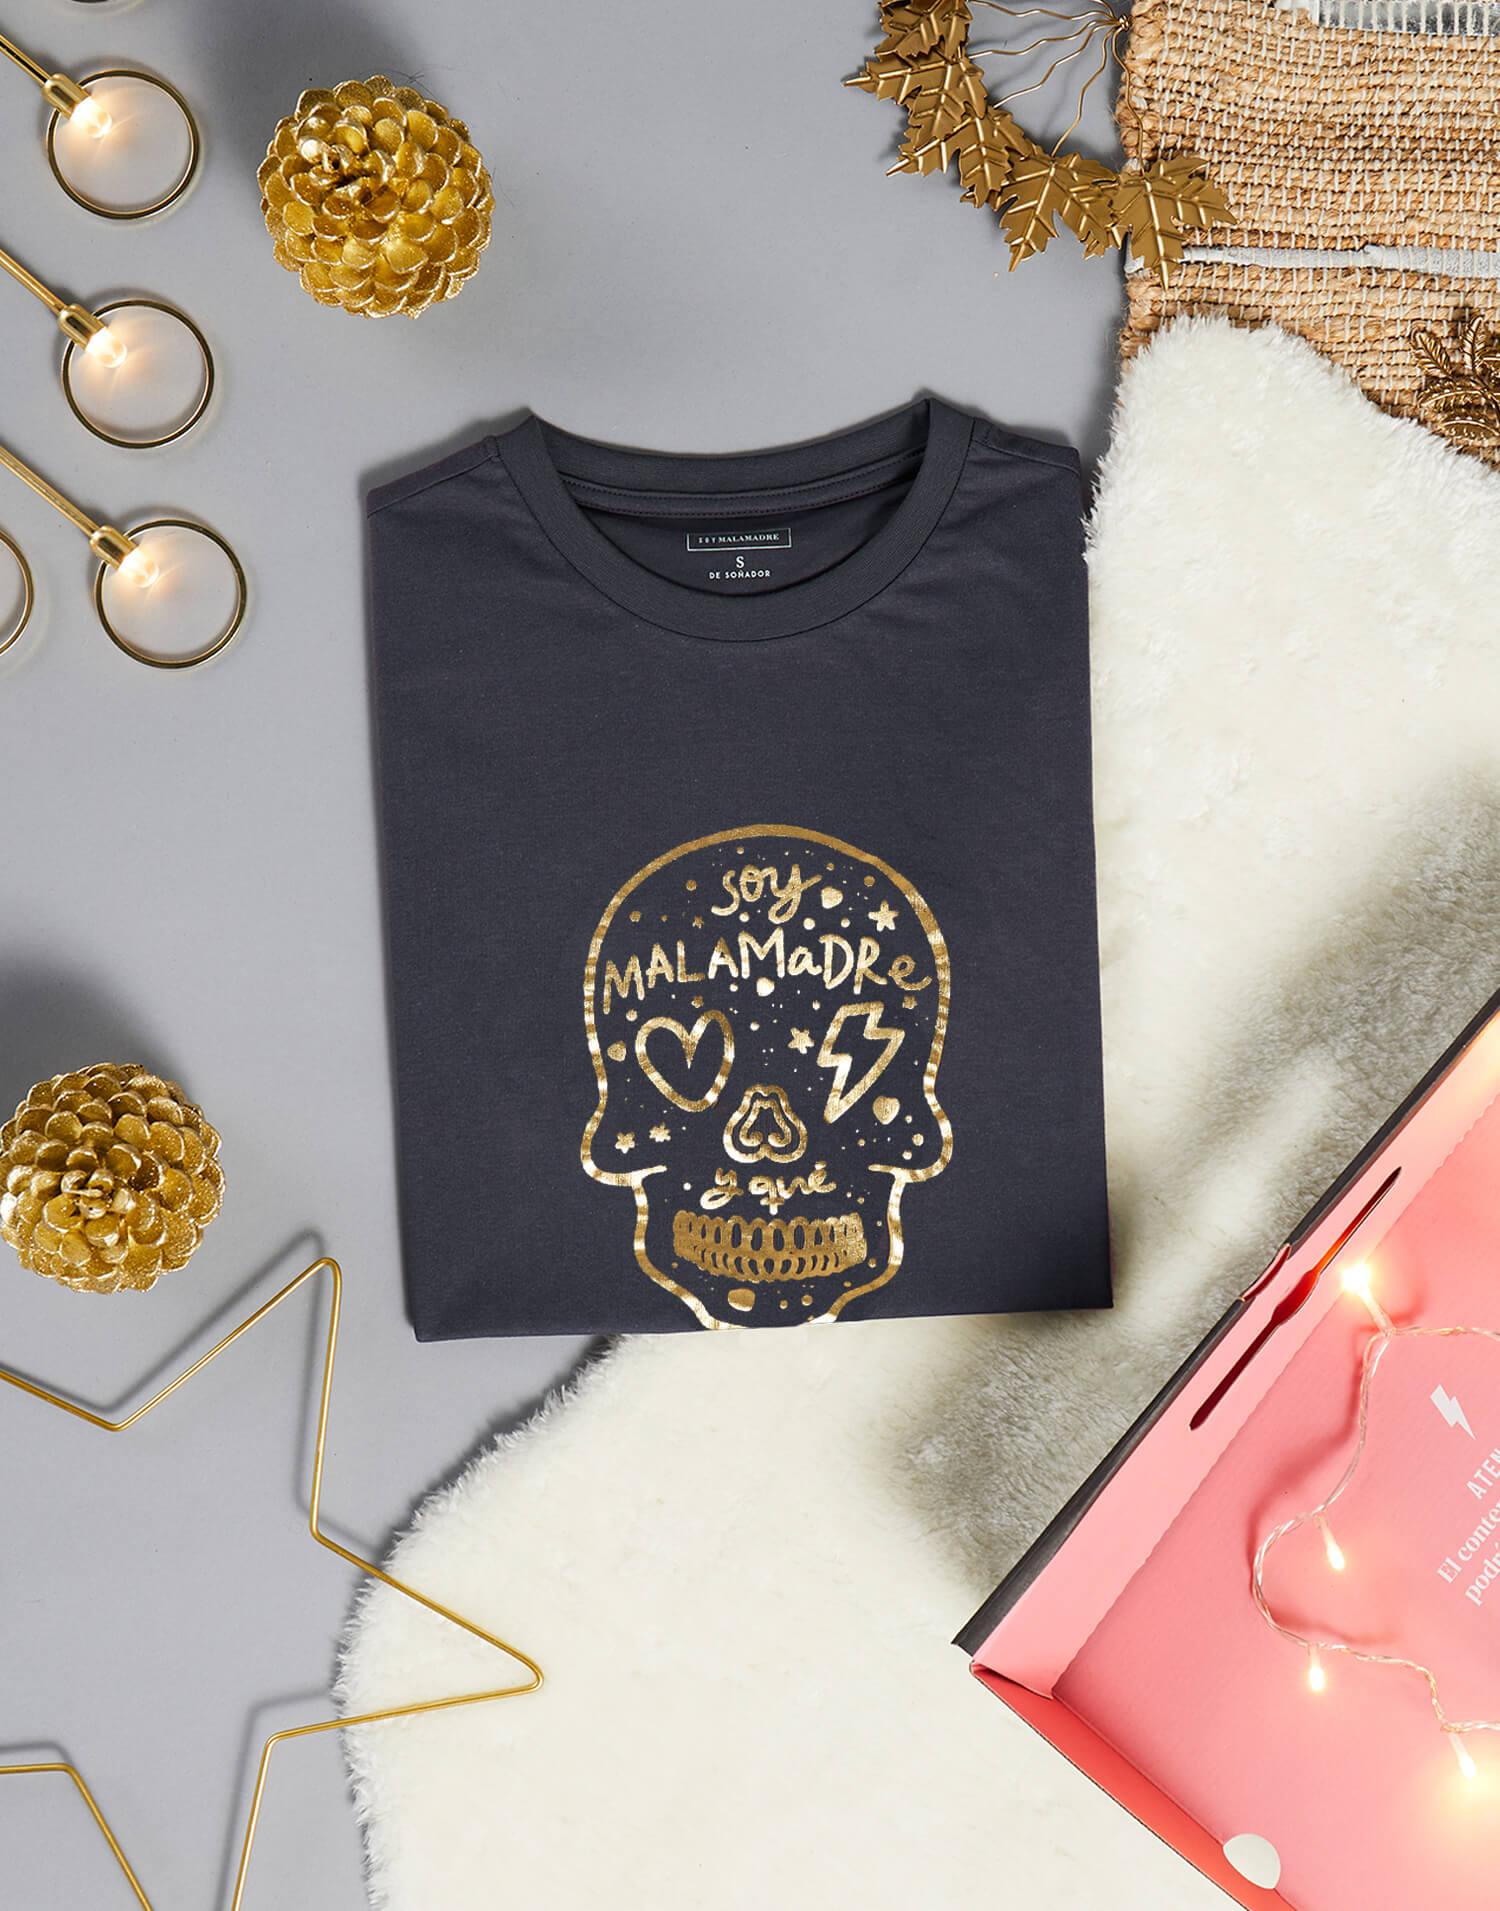 Kit con camiseta para Malasmadres convencidas